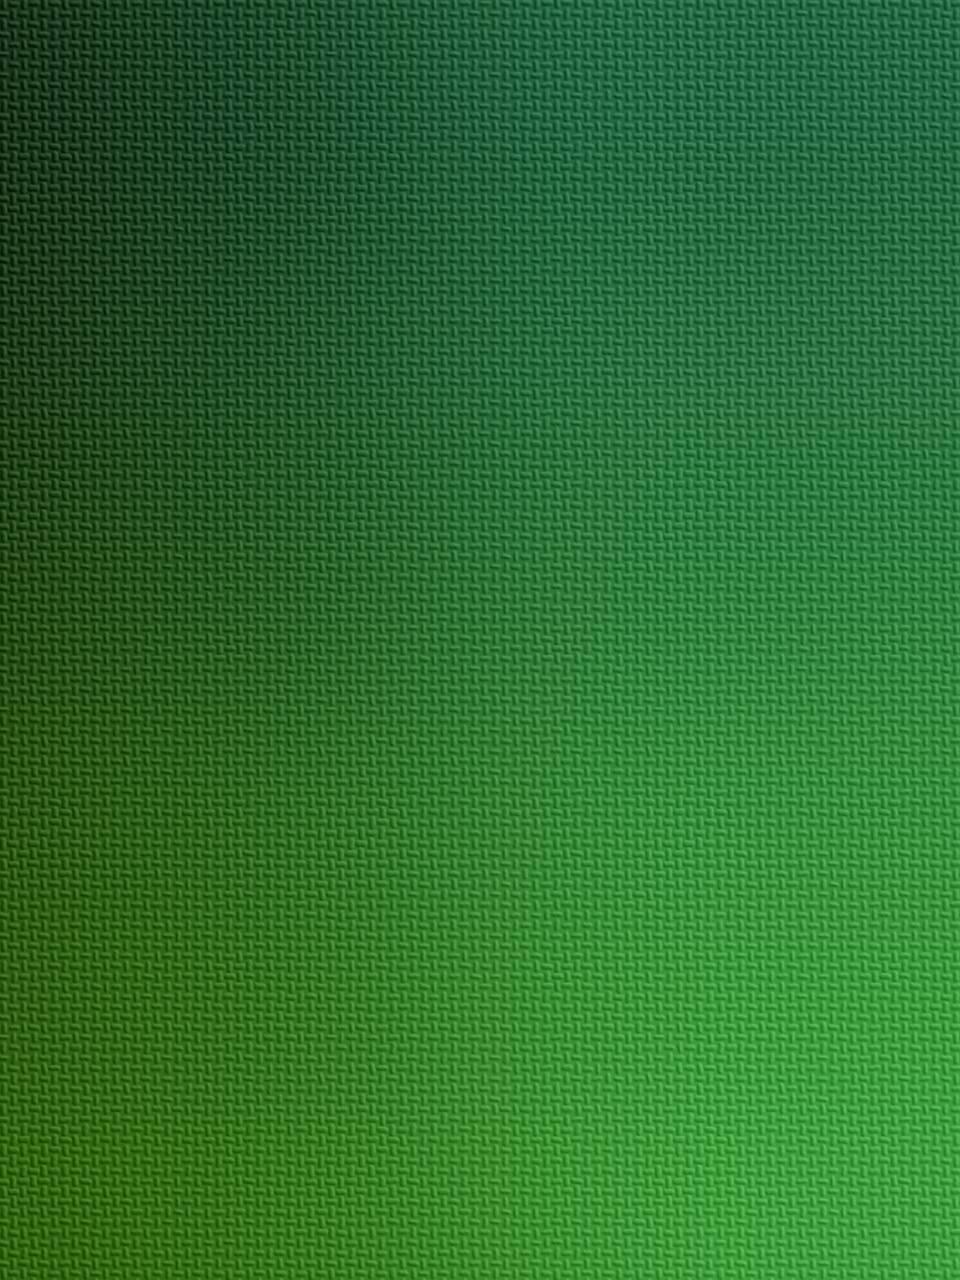 Green Gradient iPX